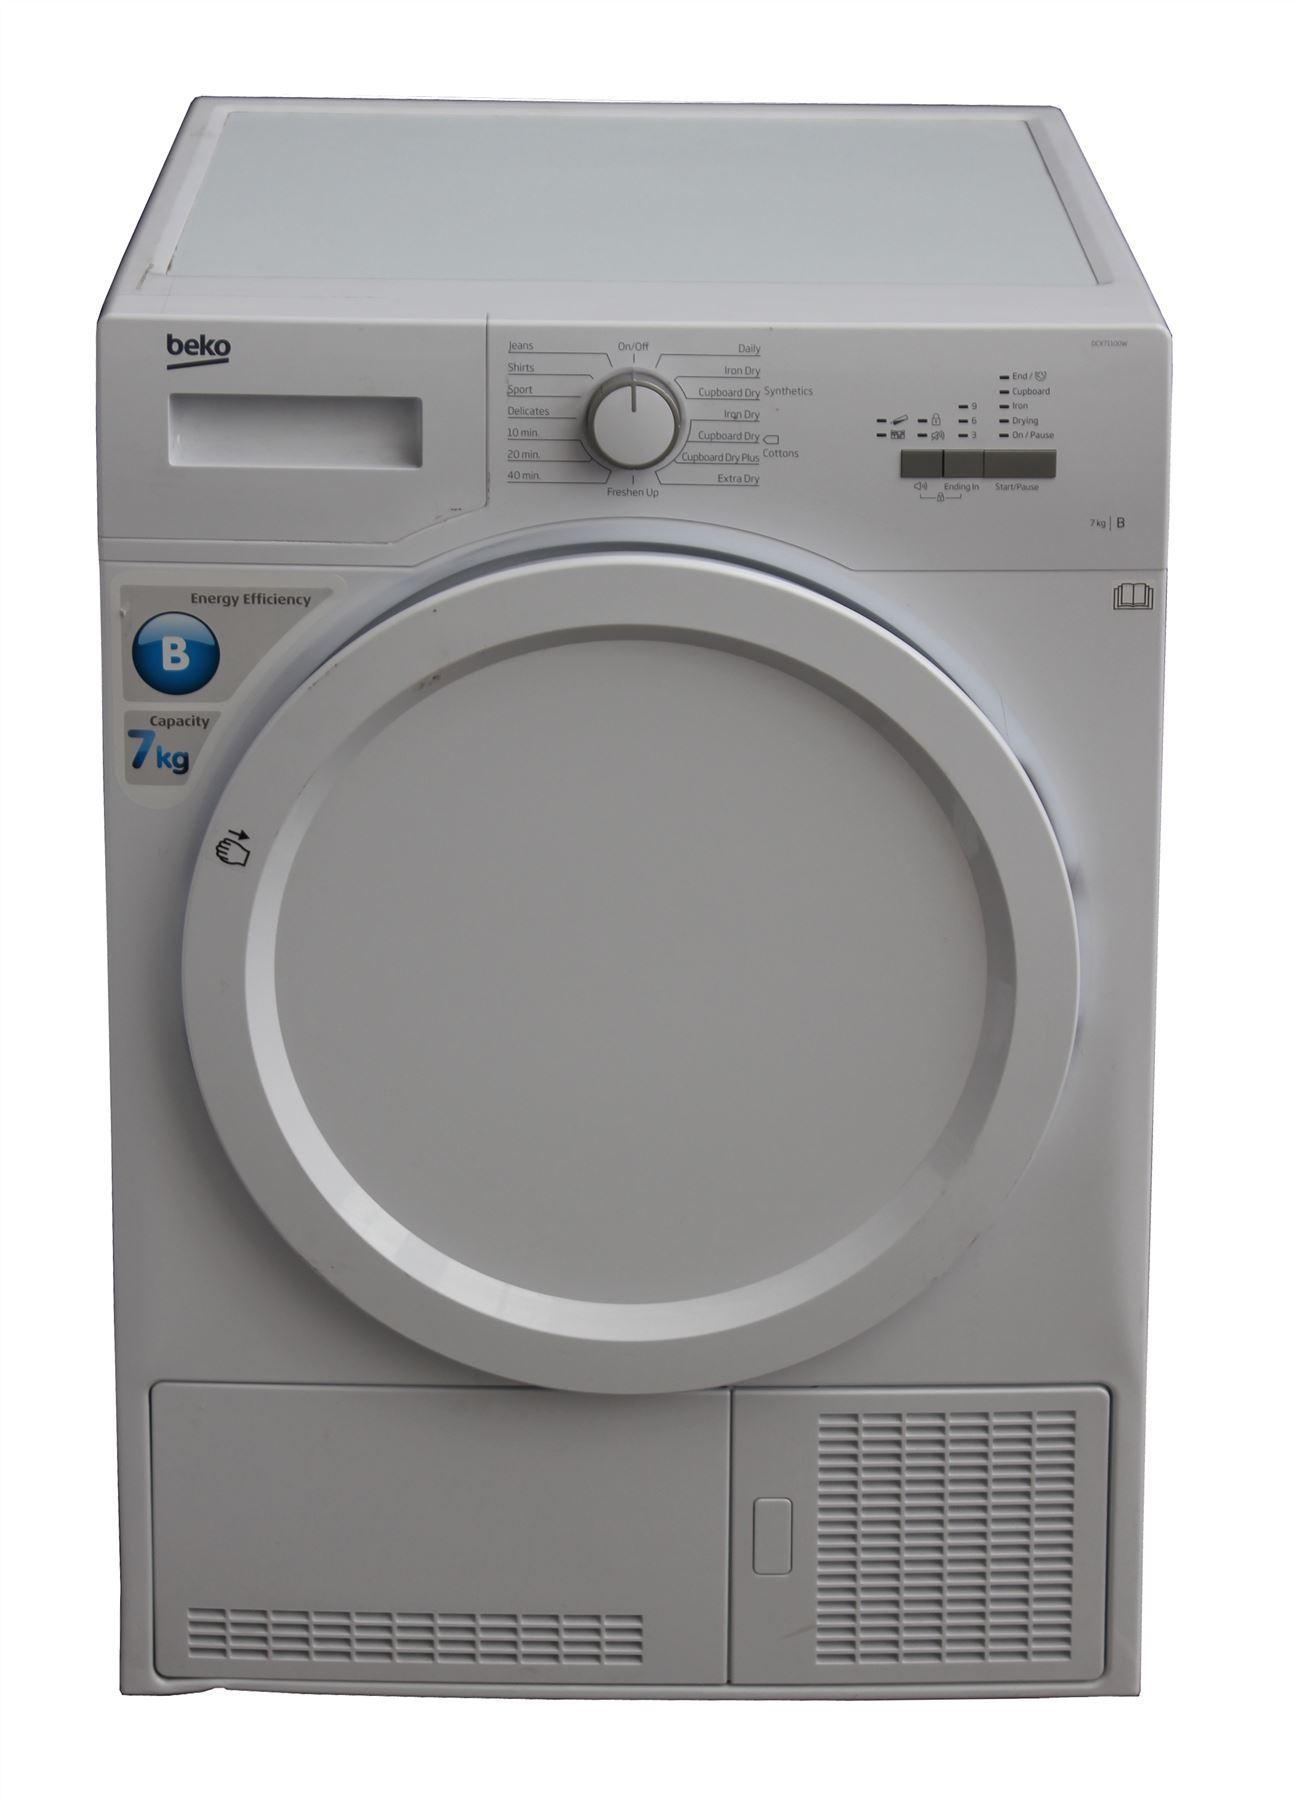 beko condenser tumble dryer dcx71100w white freestanding. Black Bedroom Furniture Sets. Home Design Ideas